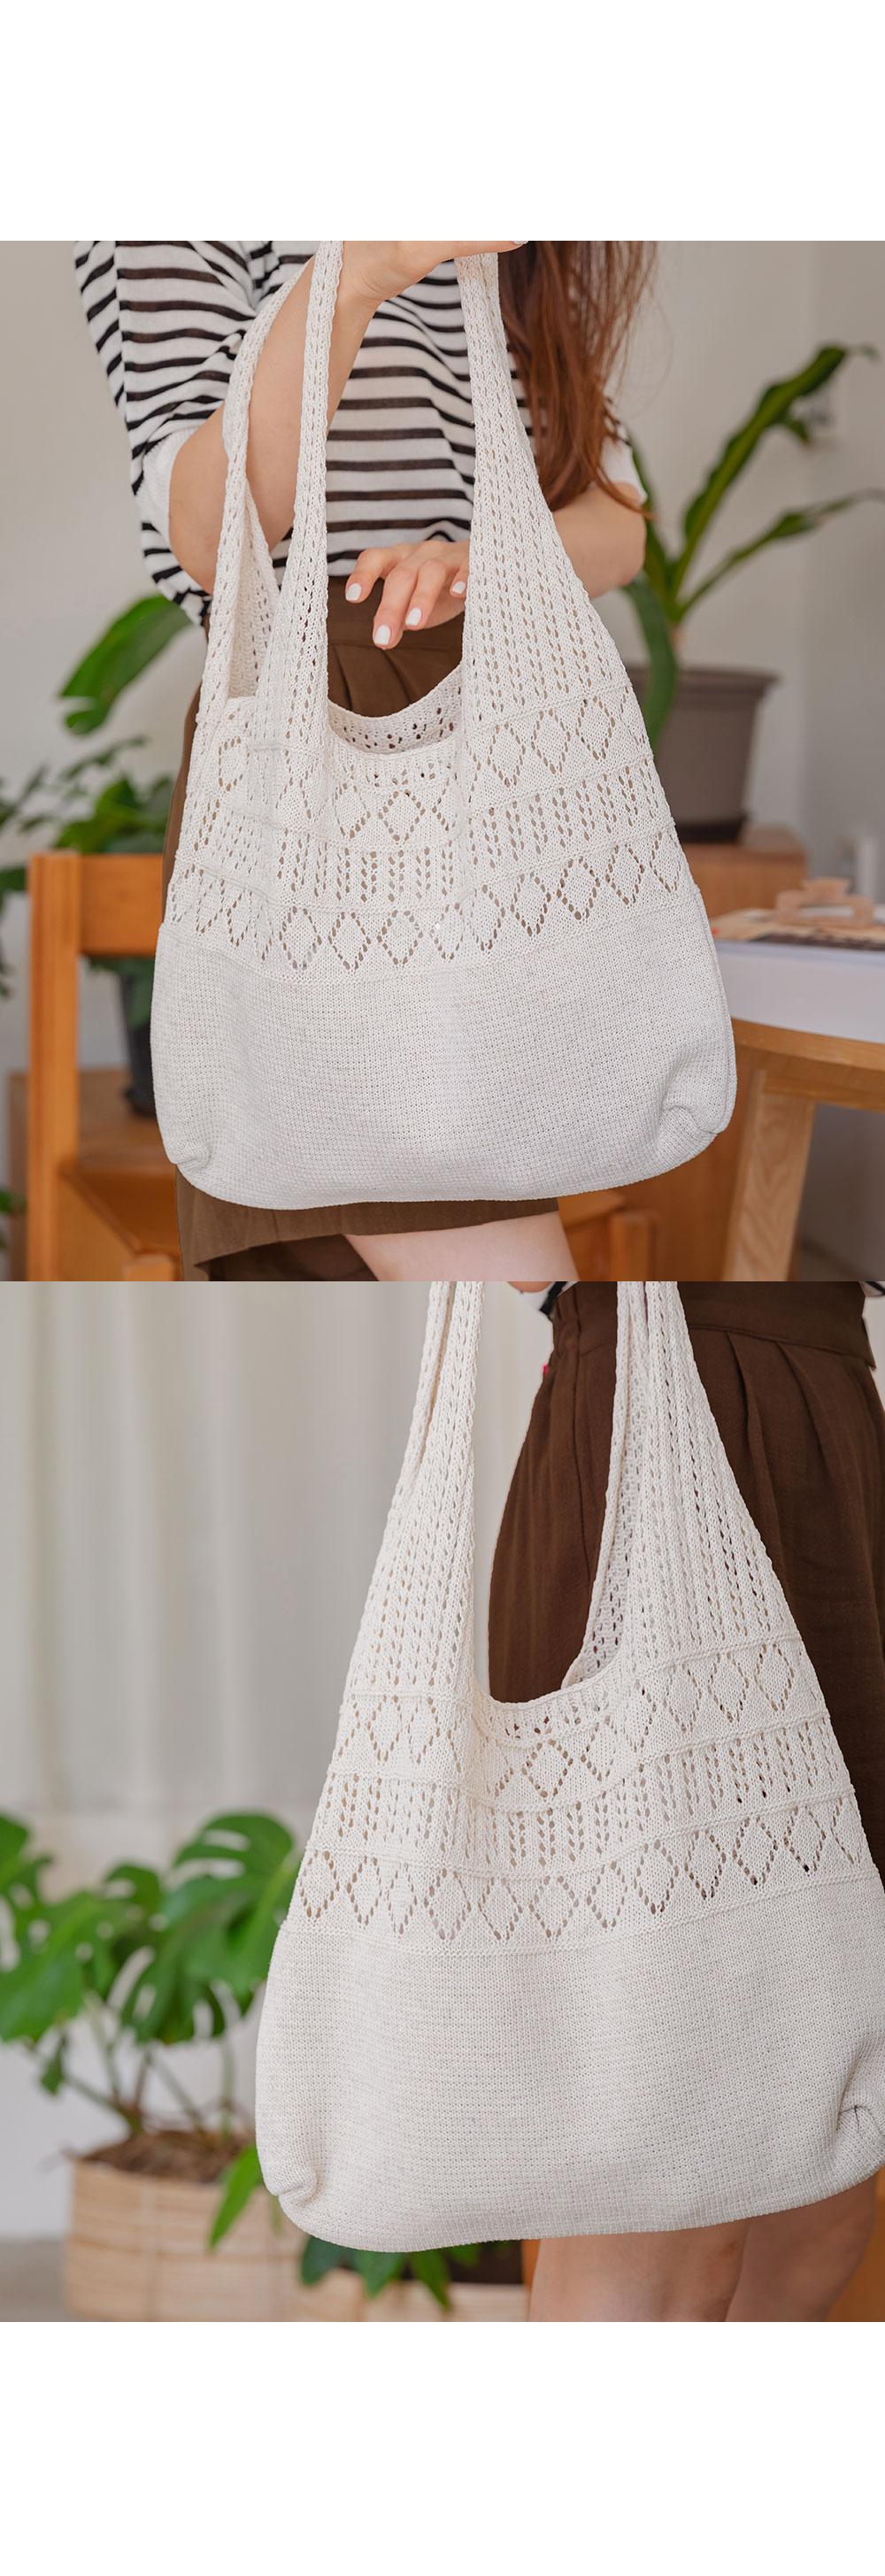 Organic Net Knitwear Bag